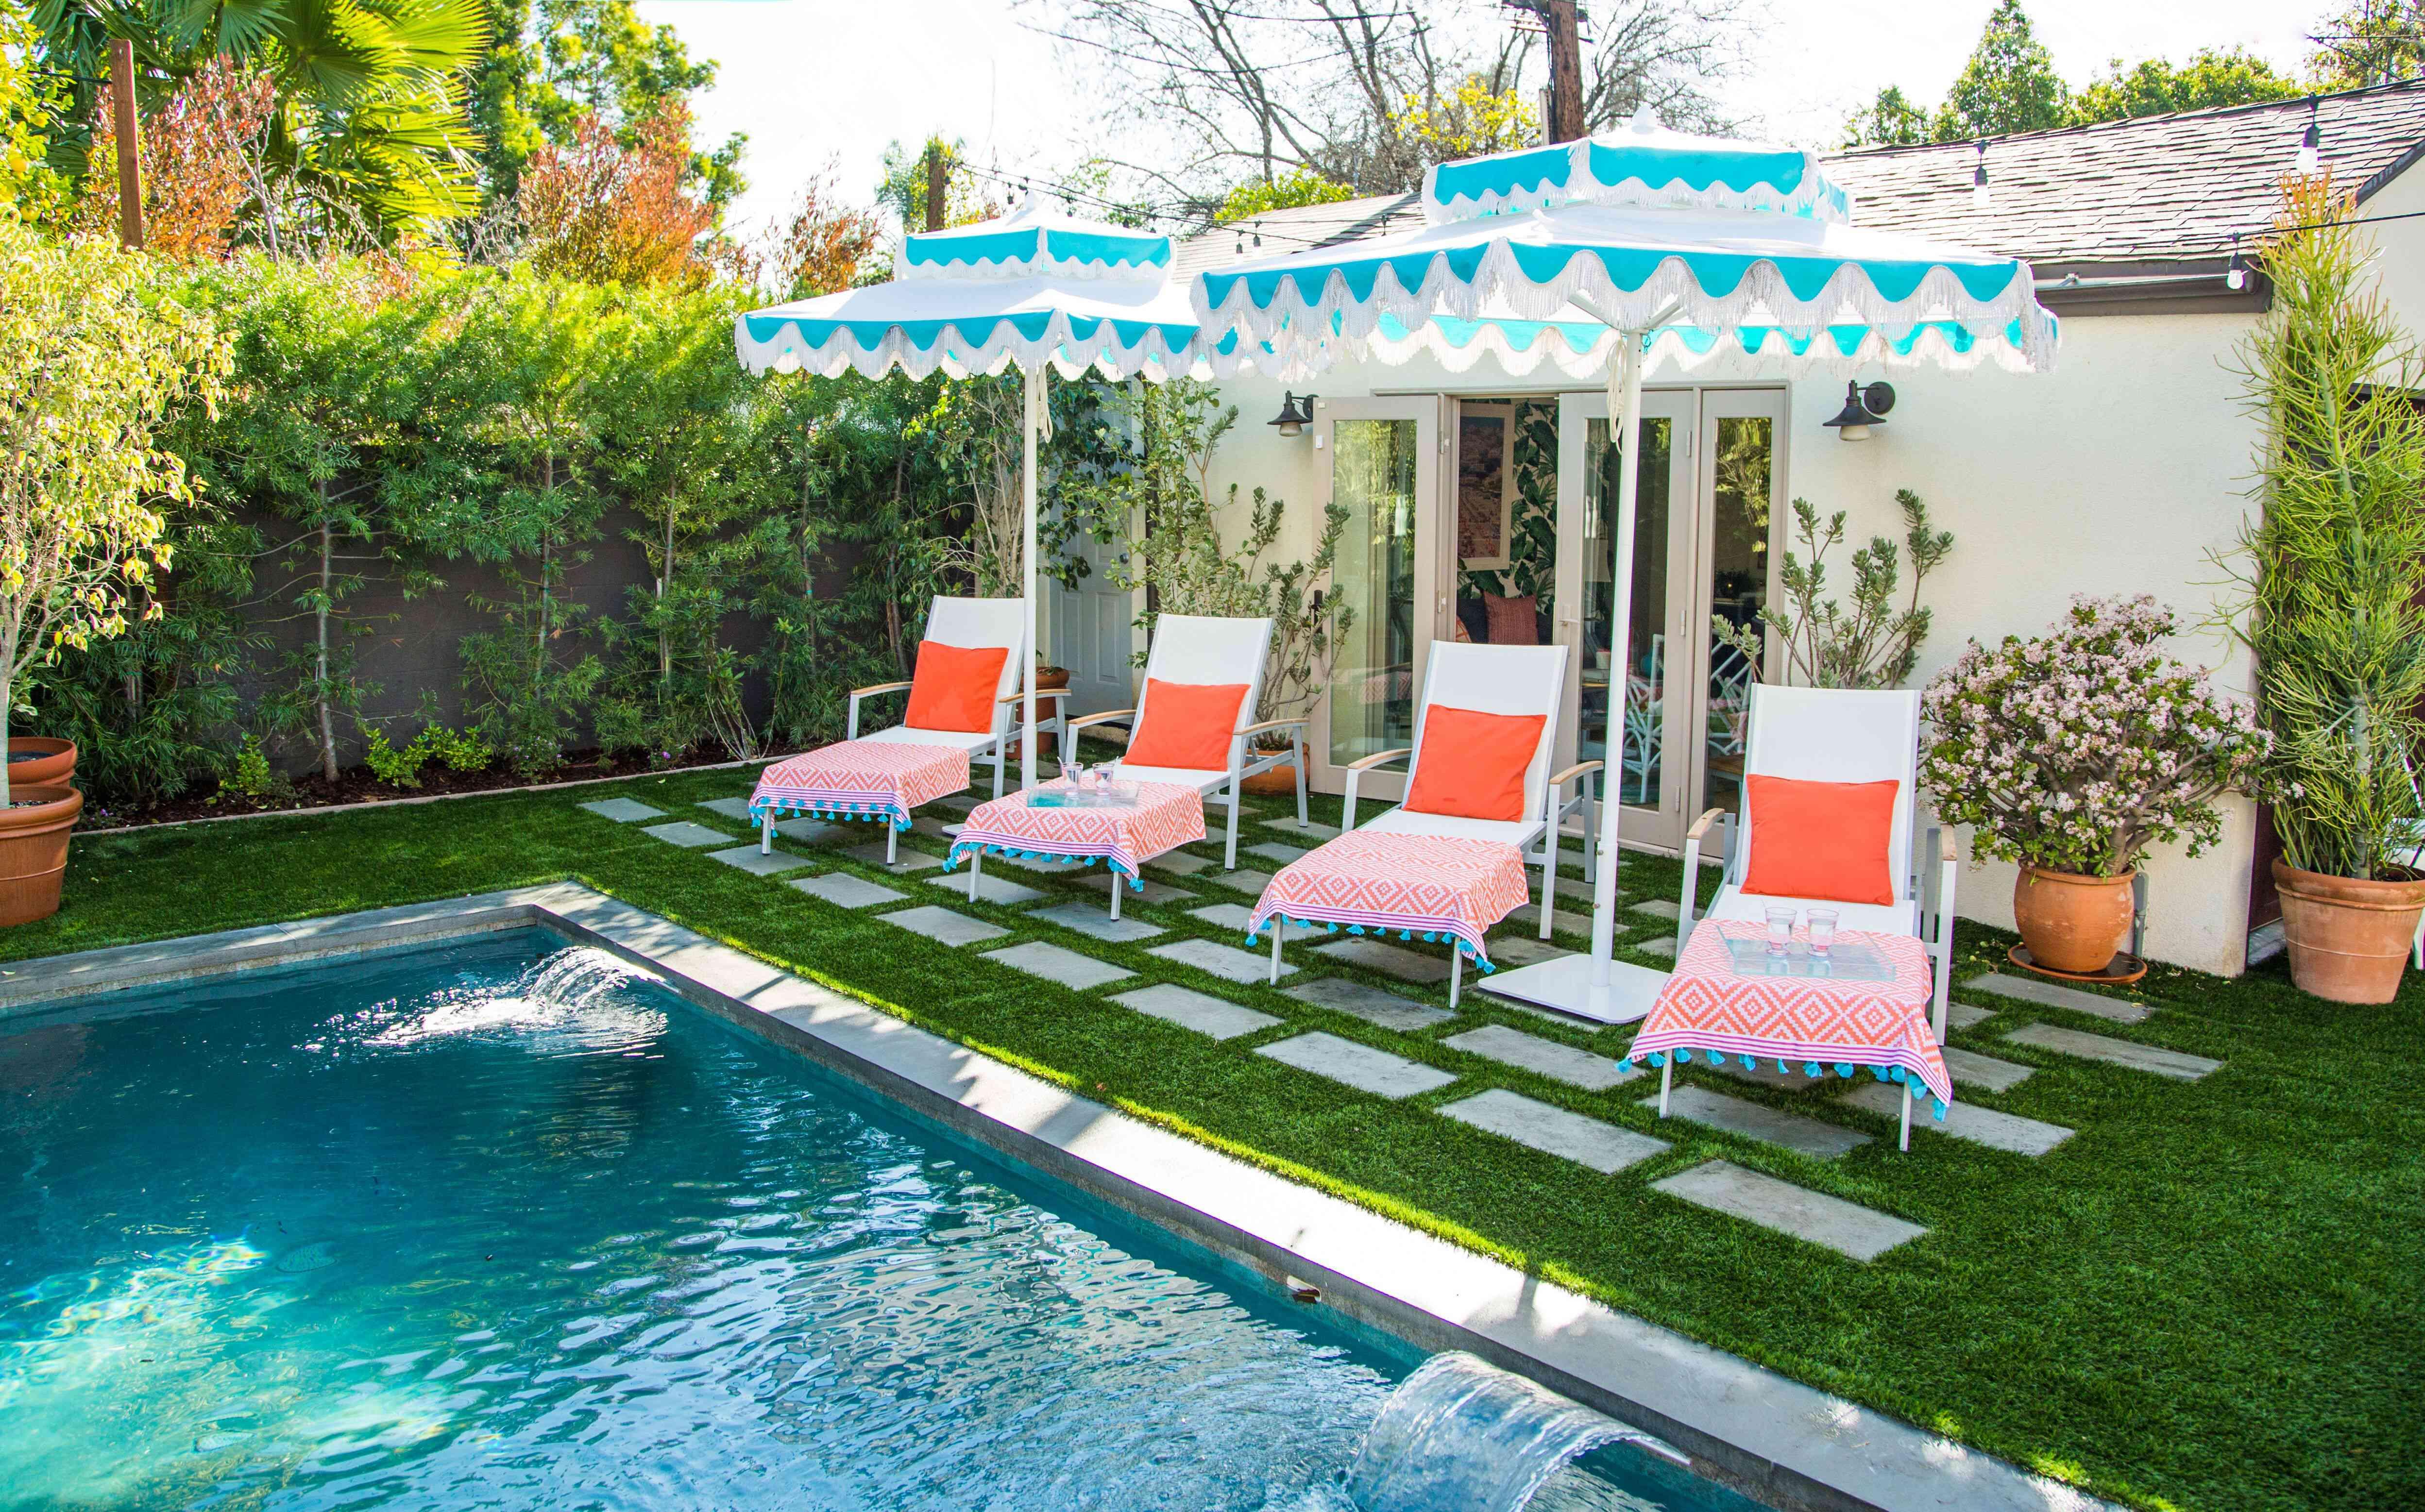 Pool house decorating ideas